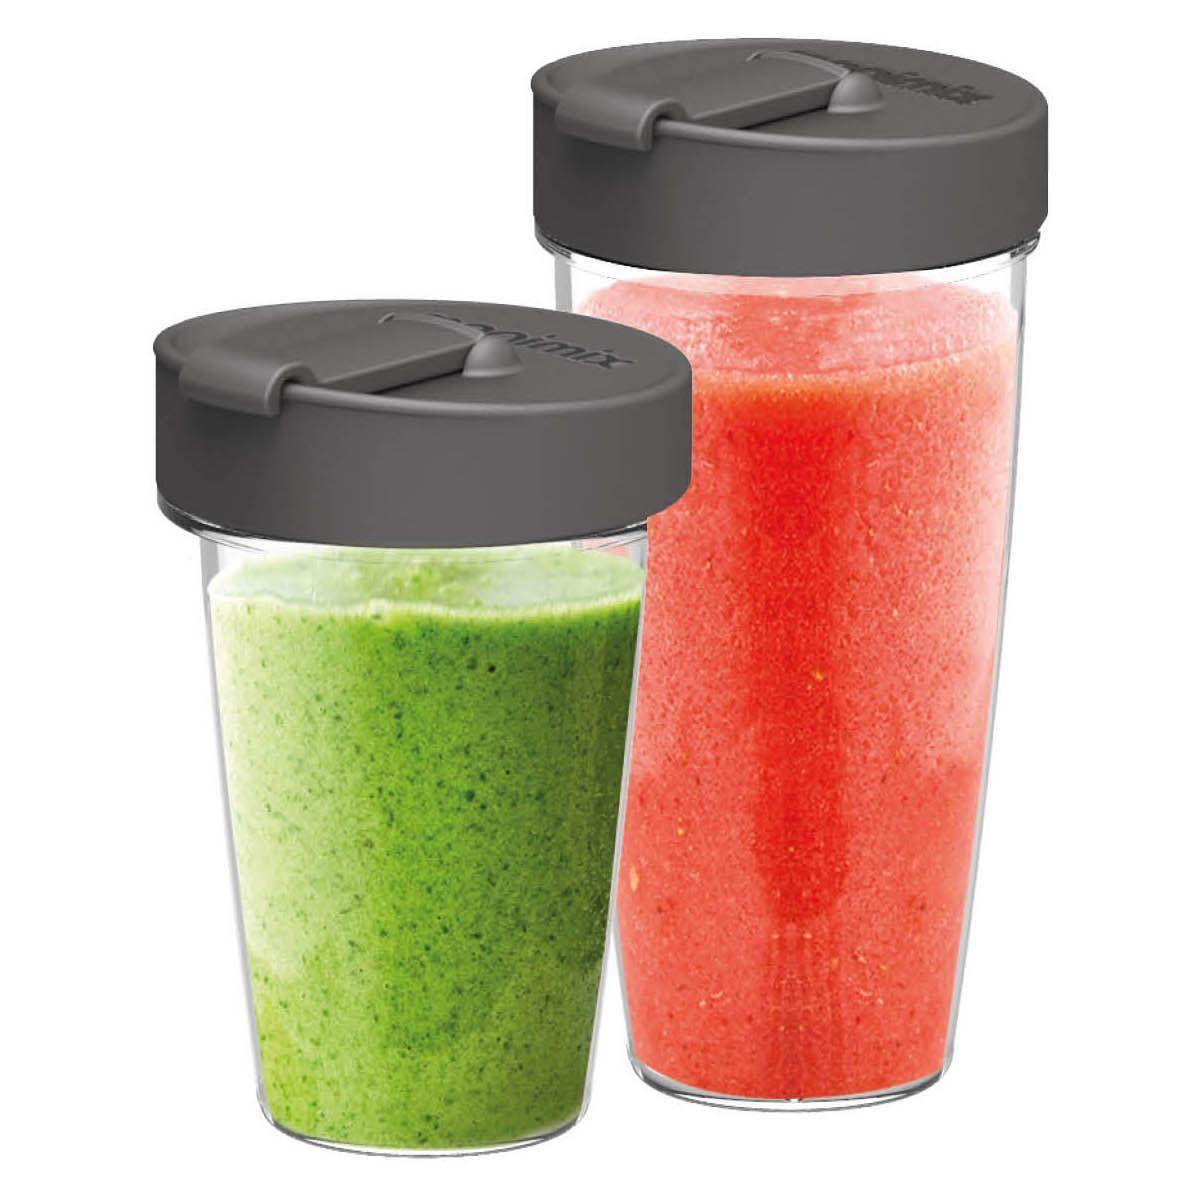 Blender magimix blend cups 17243 pour blender - livraison offerte : code livprem (photo)